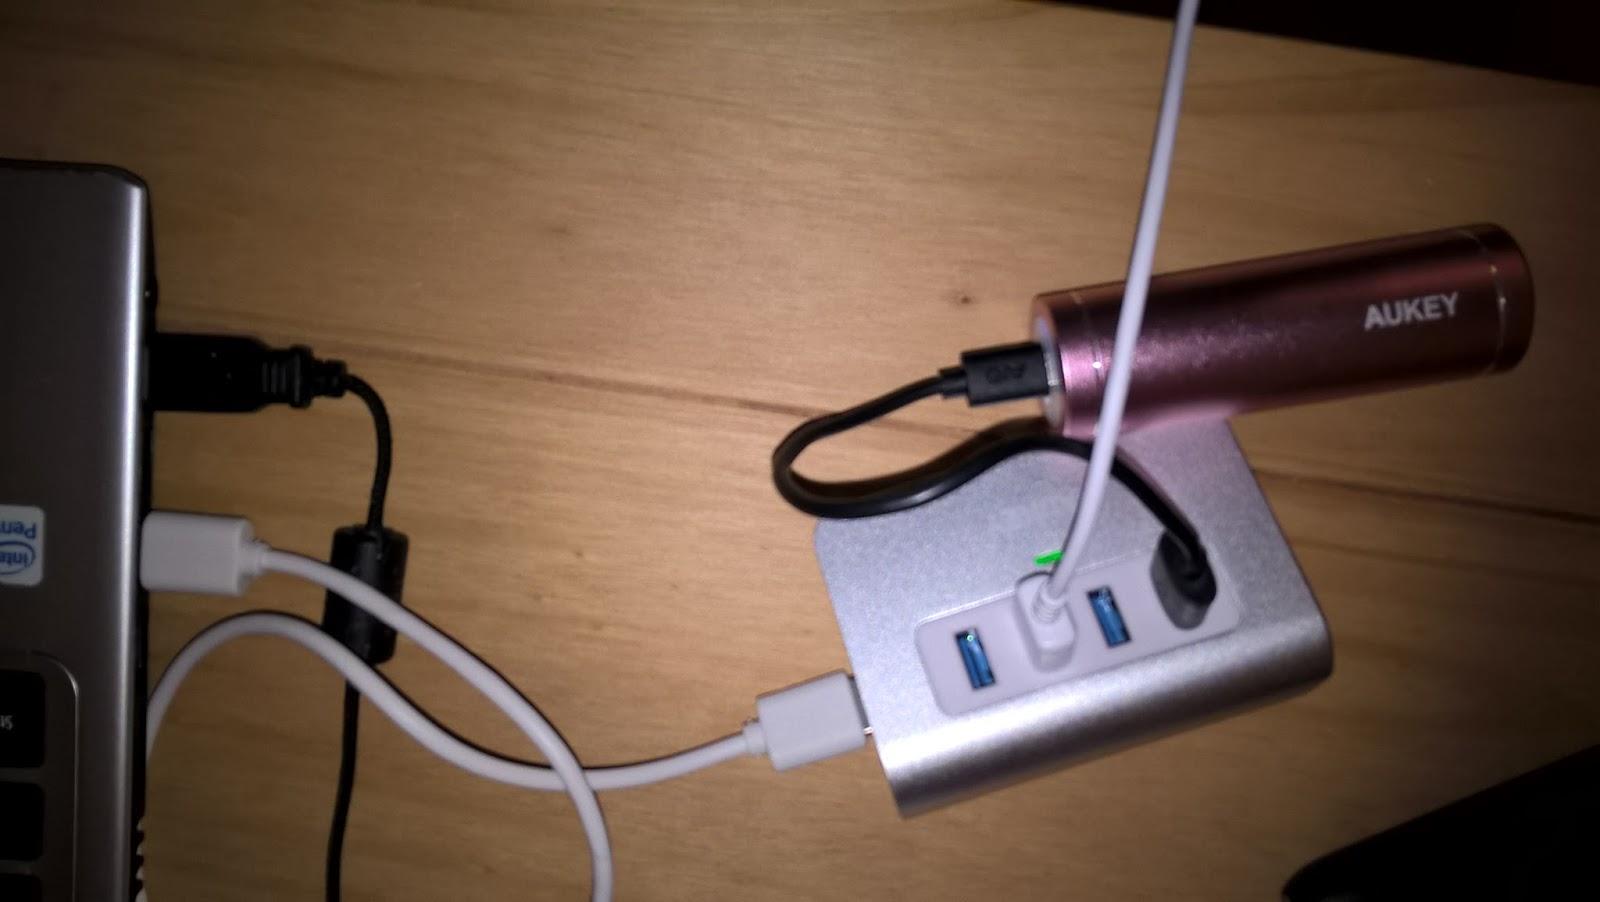 Jennys Testwelt : AUKEY USB 3.0 Hub 4 Port Super Speed ...